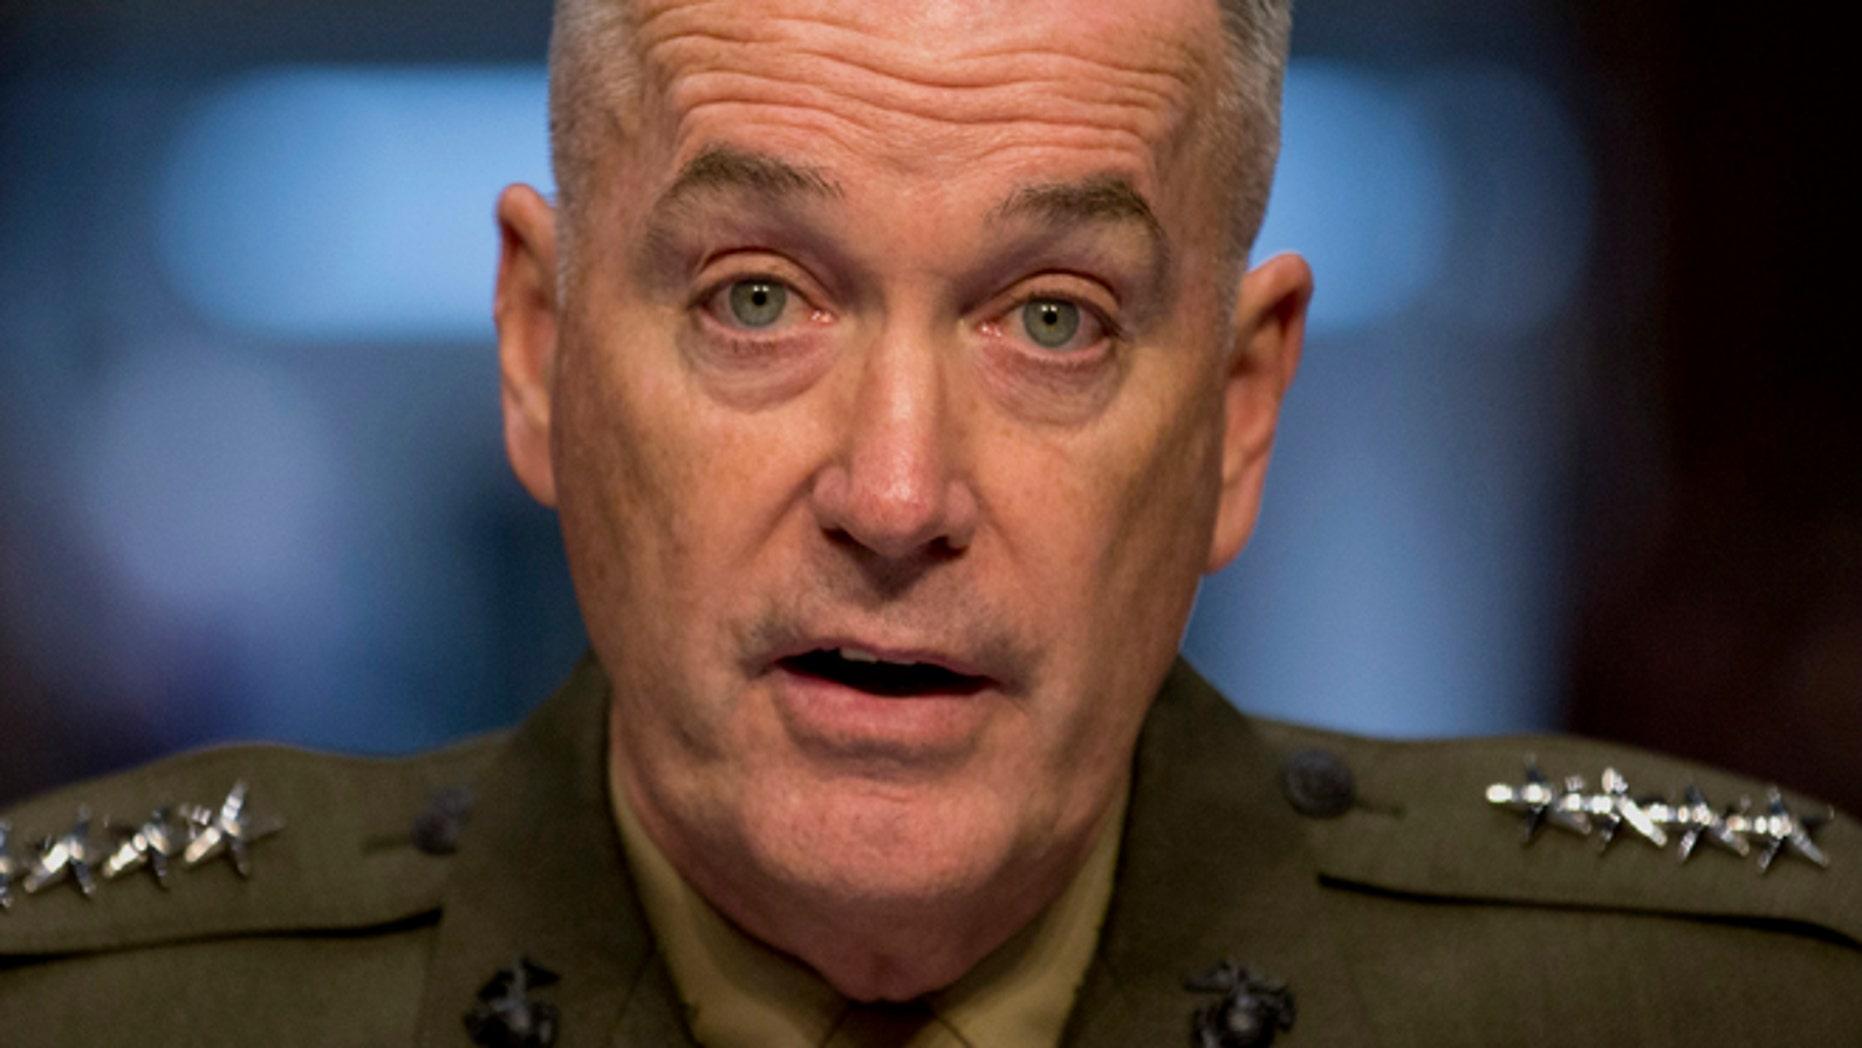 March 12, 2014: File photo, Gen. Joseph F. Dunford, Jr. testifies on Capitol Hill in Washington.